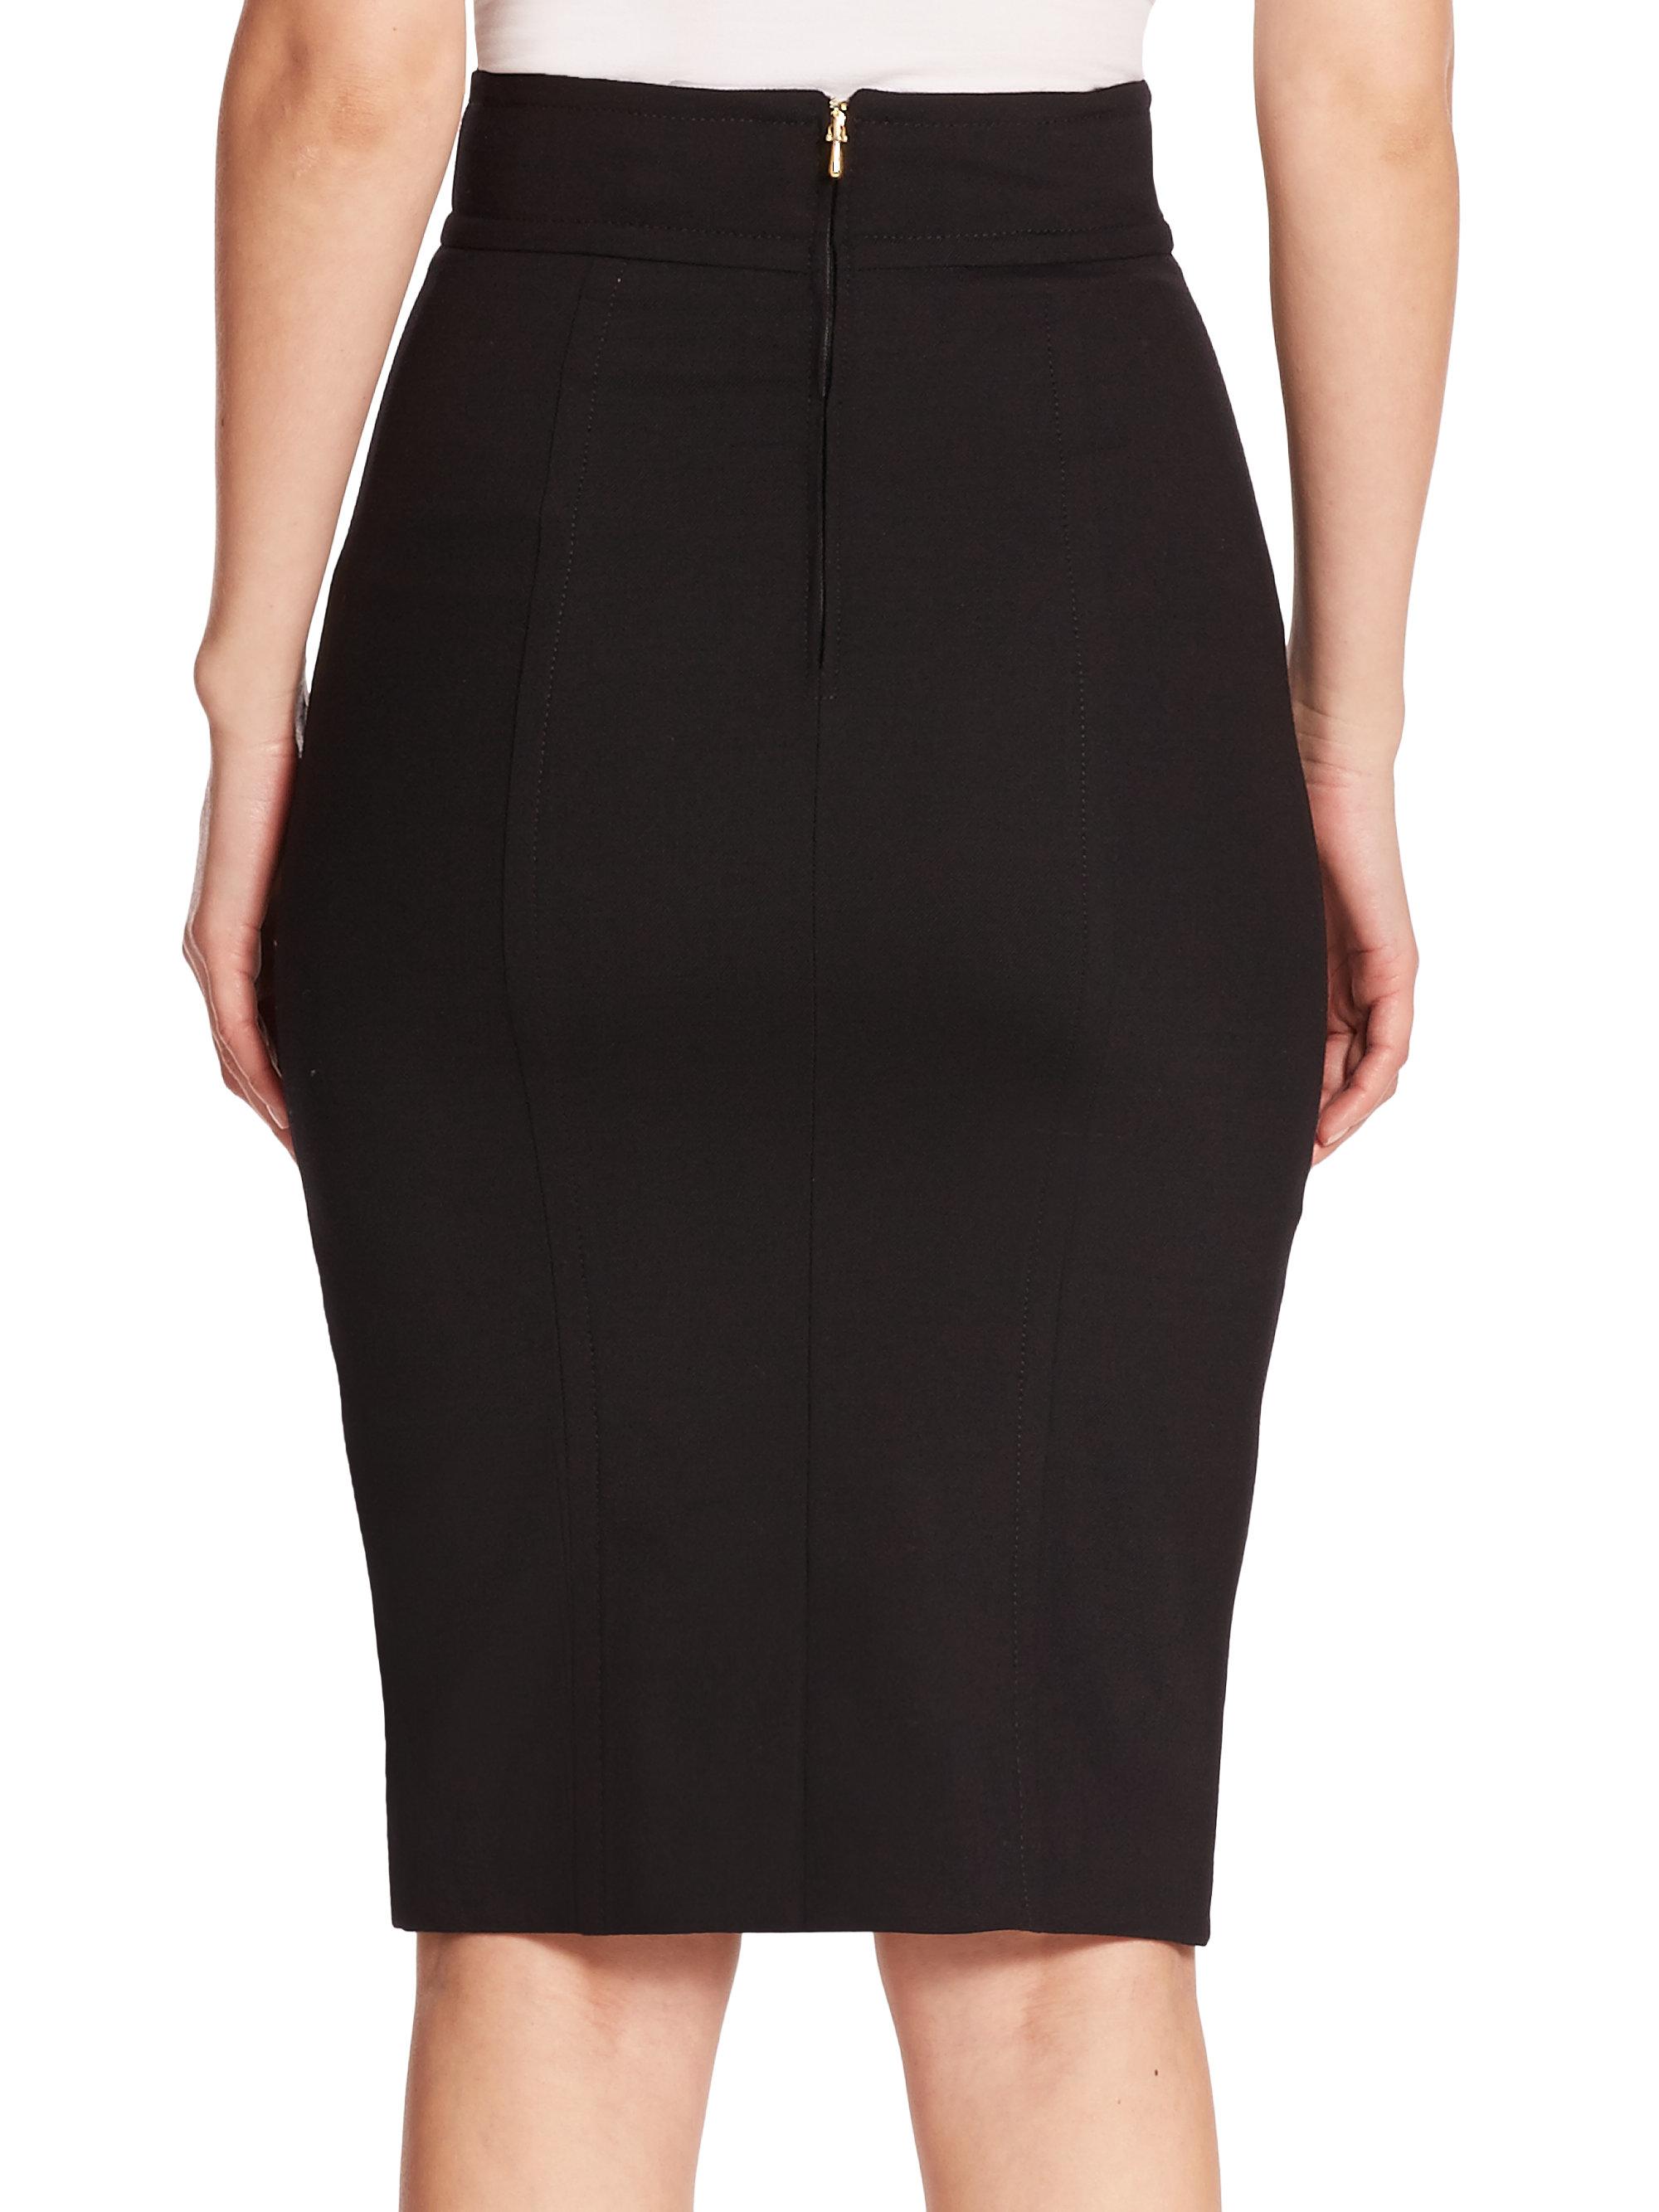 4e0d266f94 Carolina Herrera Day Collection Pencil Skirt in Black - Lyst